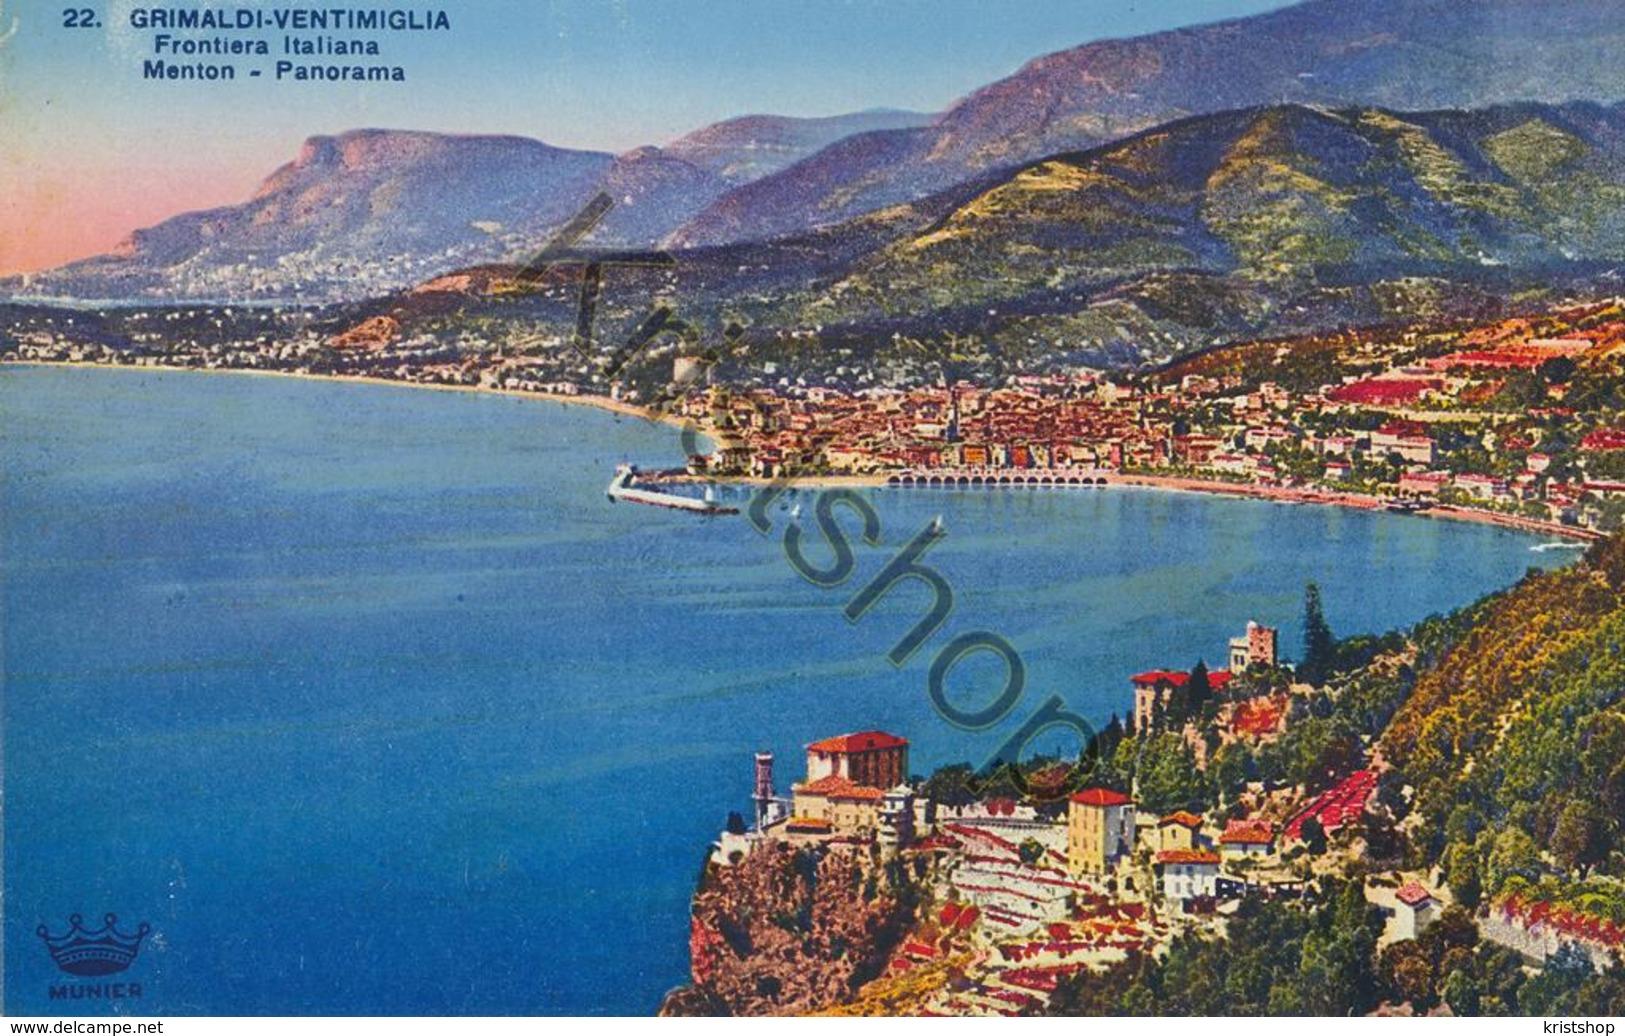 Grimaldi-Ventimiglia [AA20-2.061 - Italie